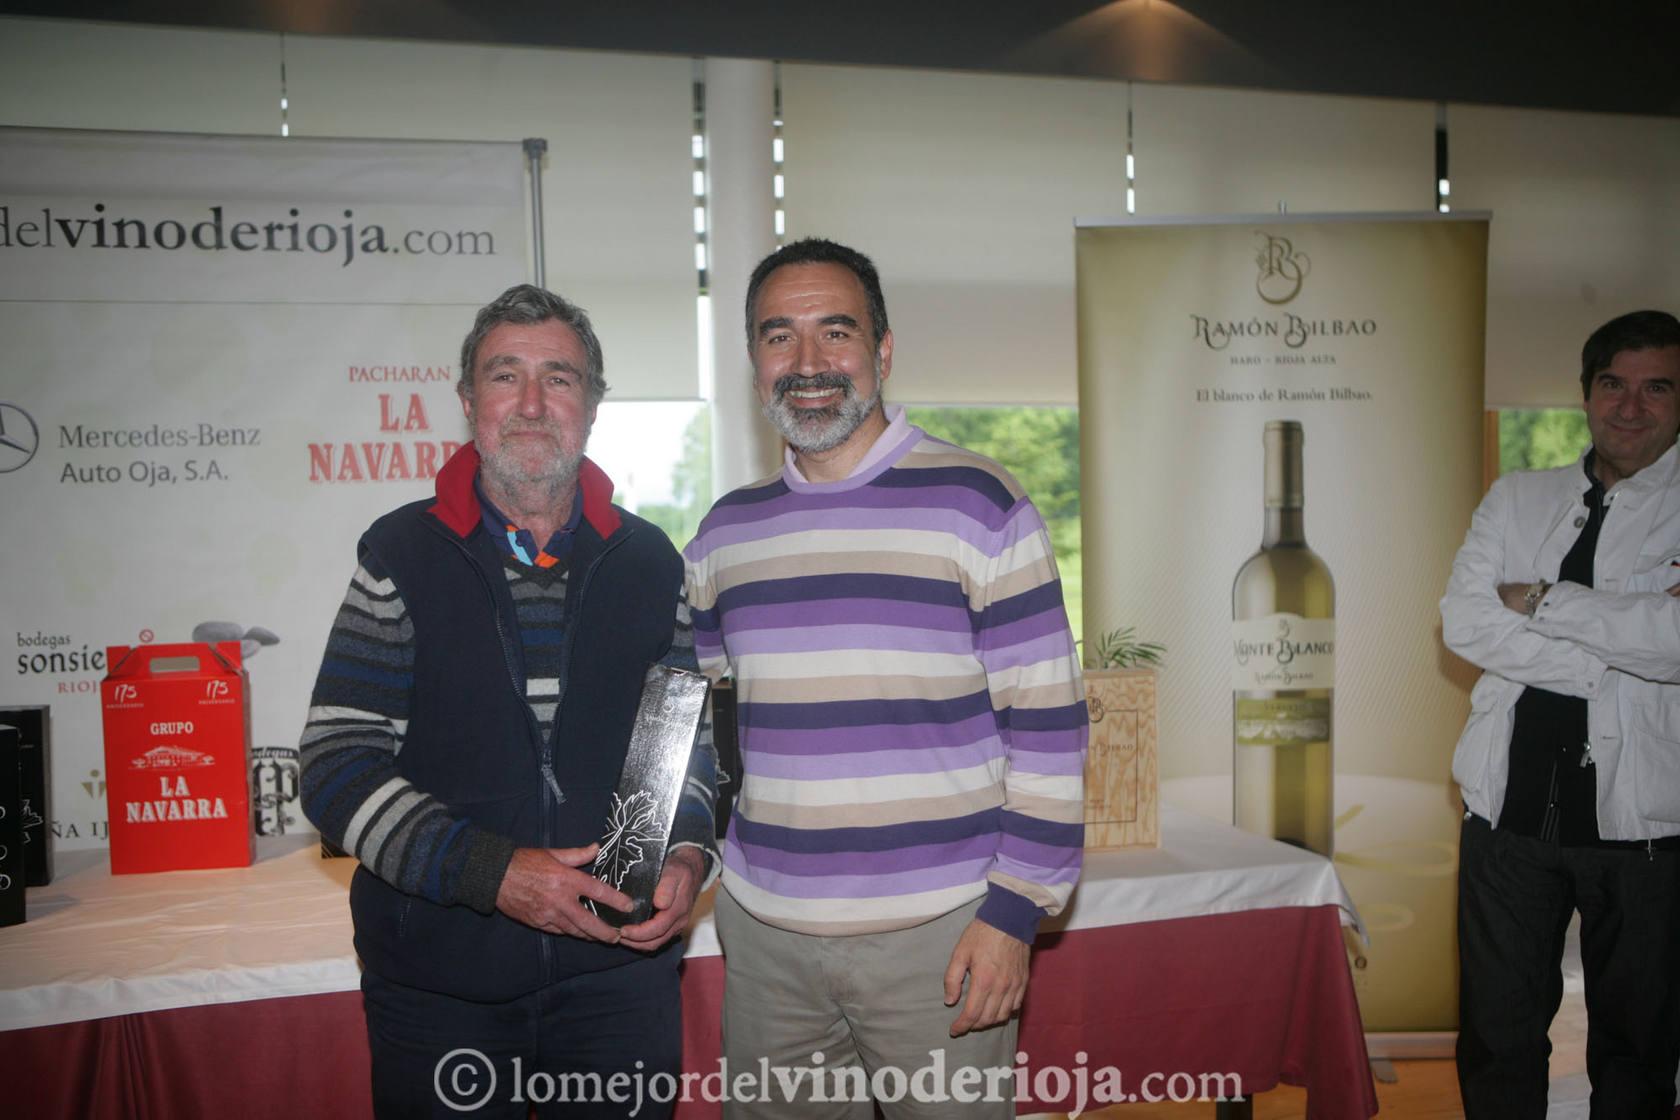 III Liga de Golf y Vino: Torneo Ramón Bilbao (Premios II)